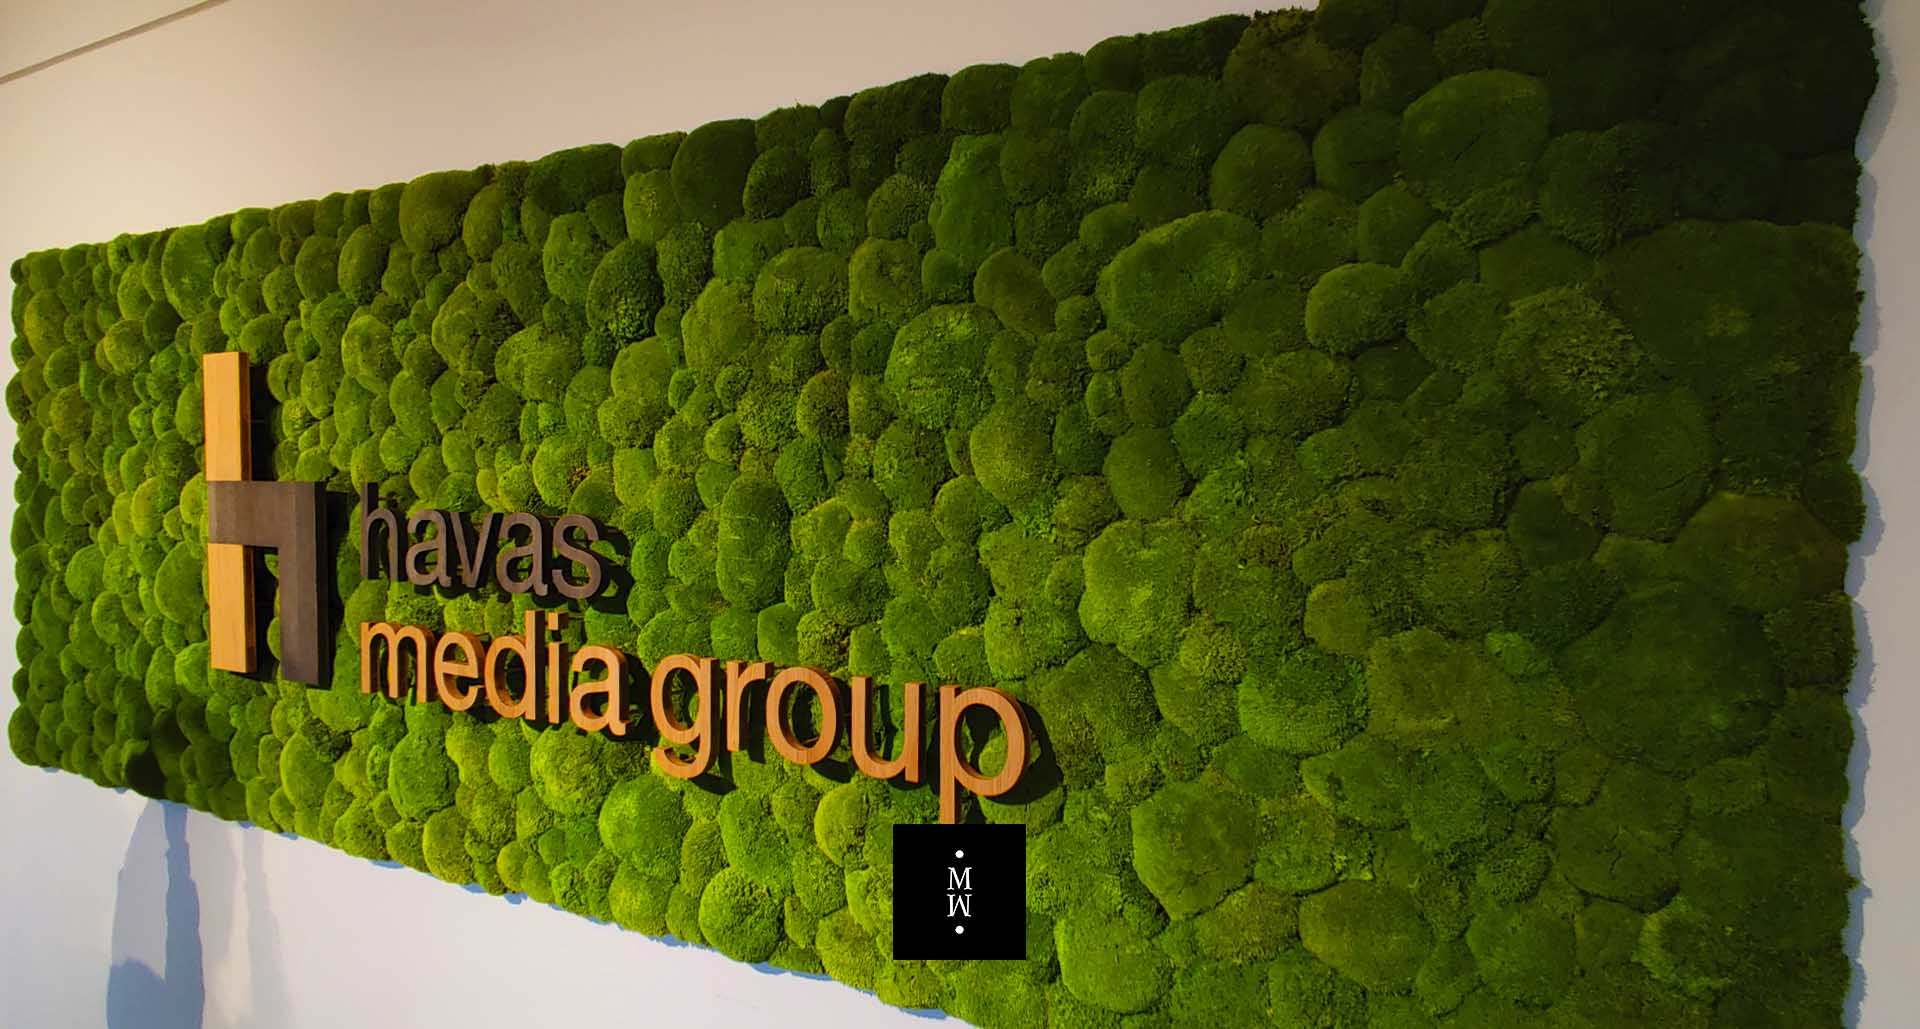 Moosbild Ballenmoos mit Logo Havas Media Group